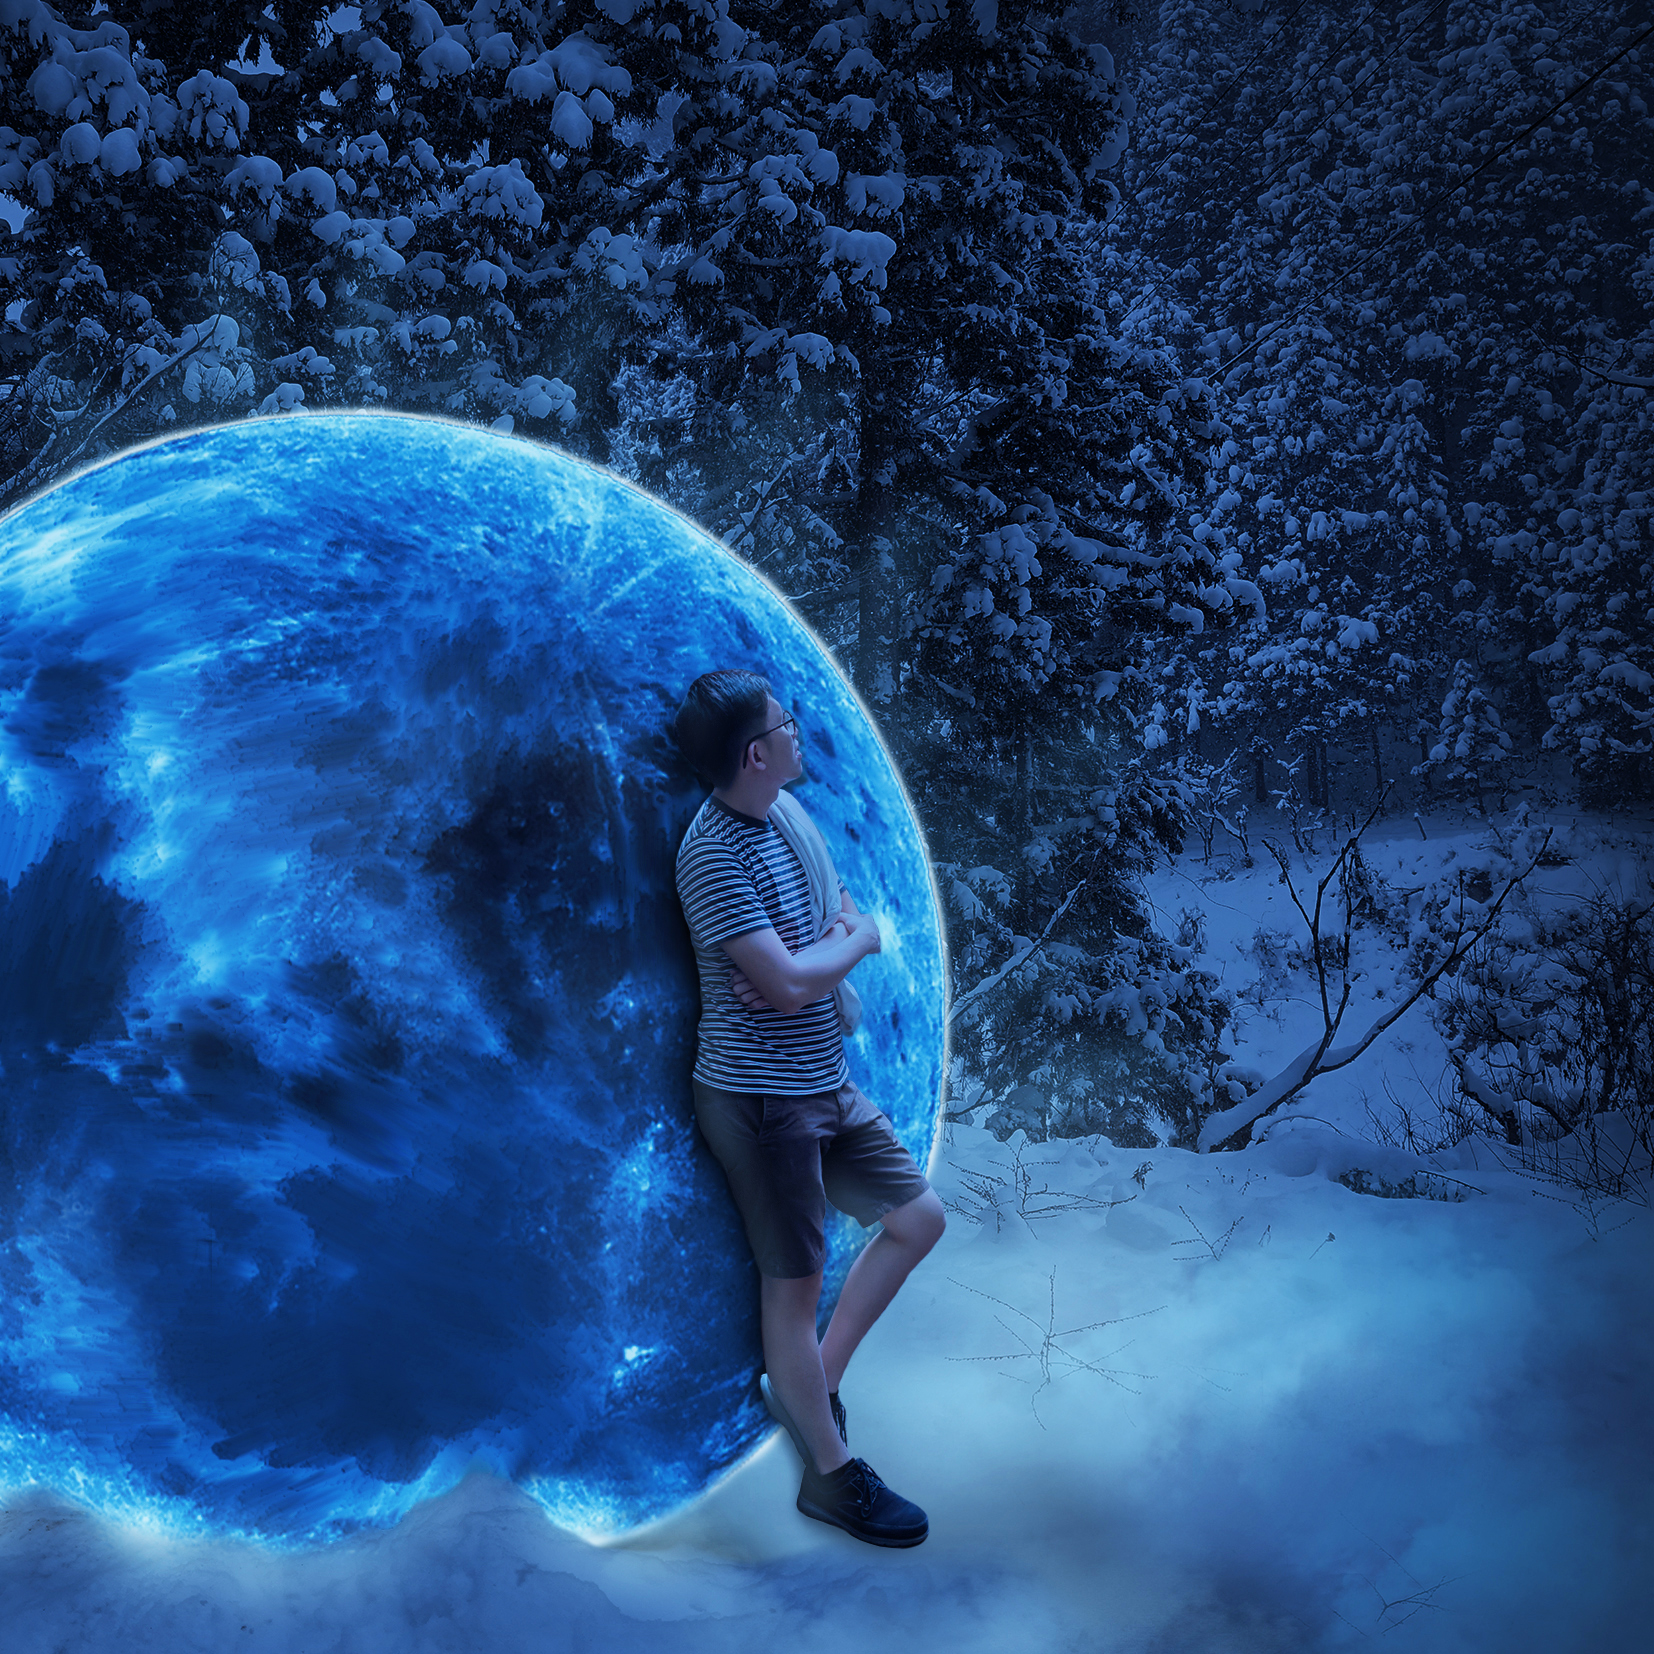 Moon Shine Digital Art by Alvin Sim